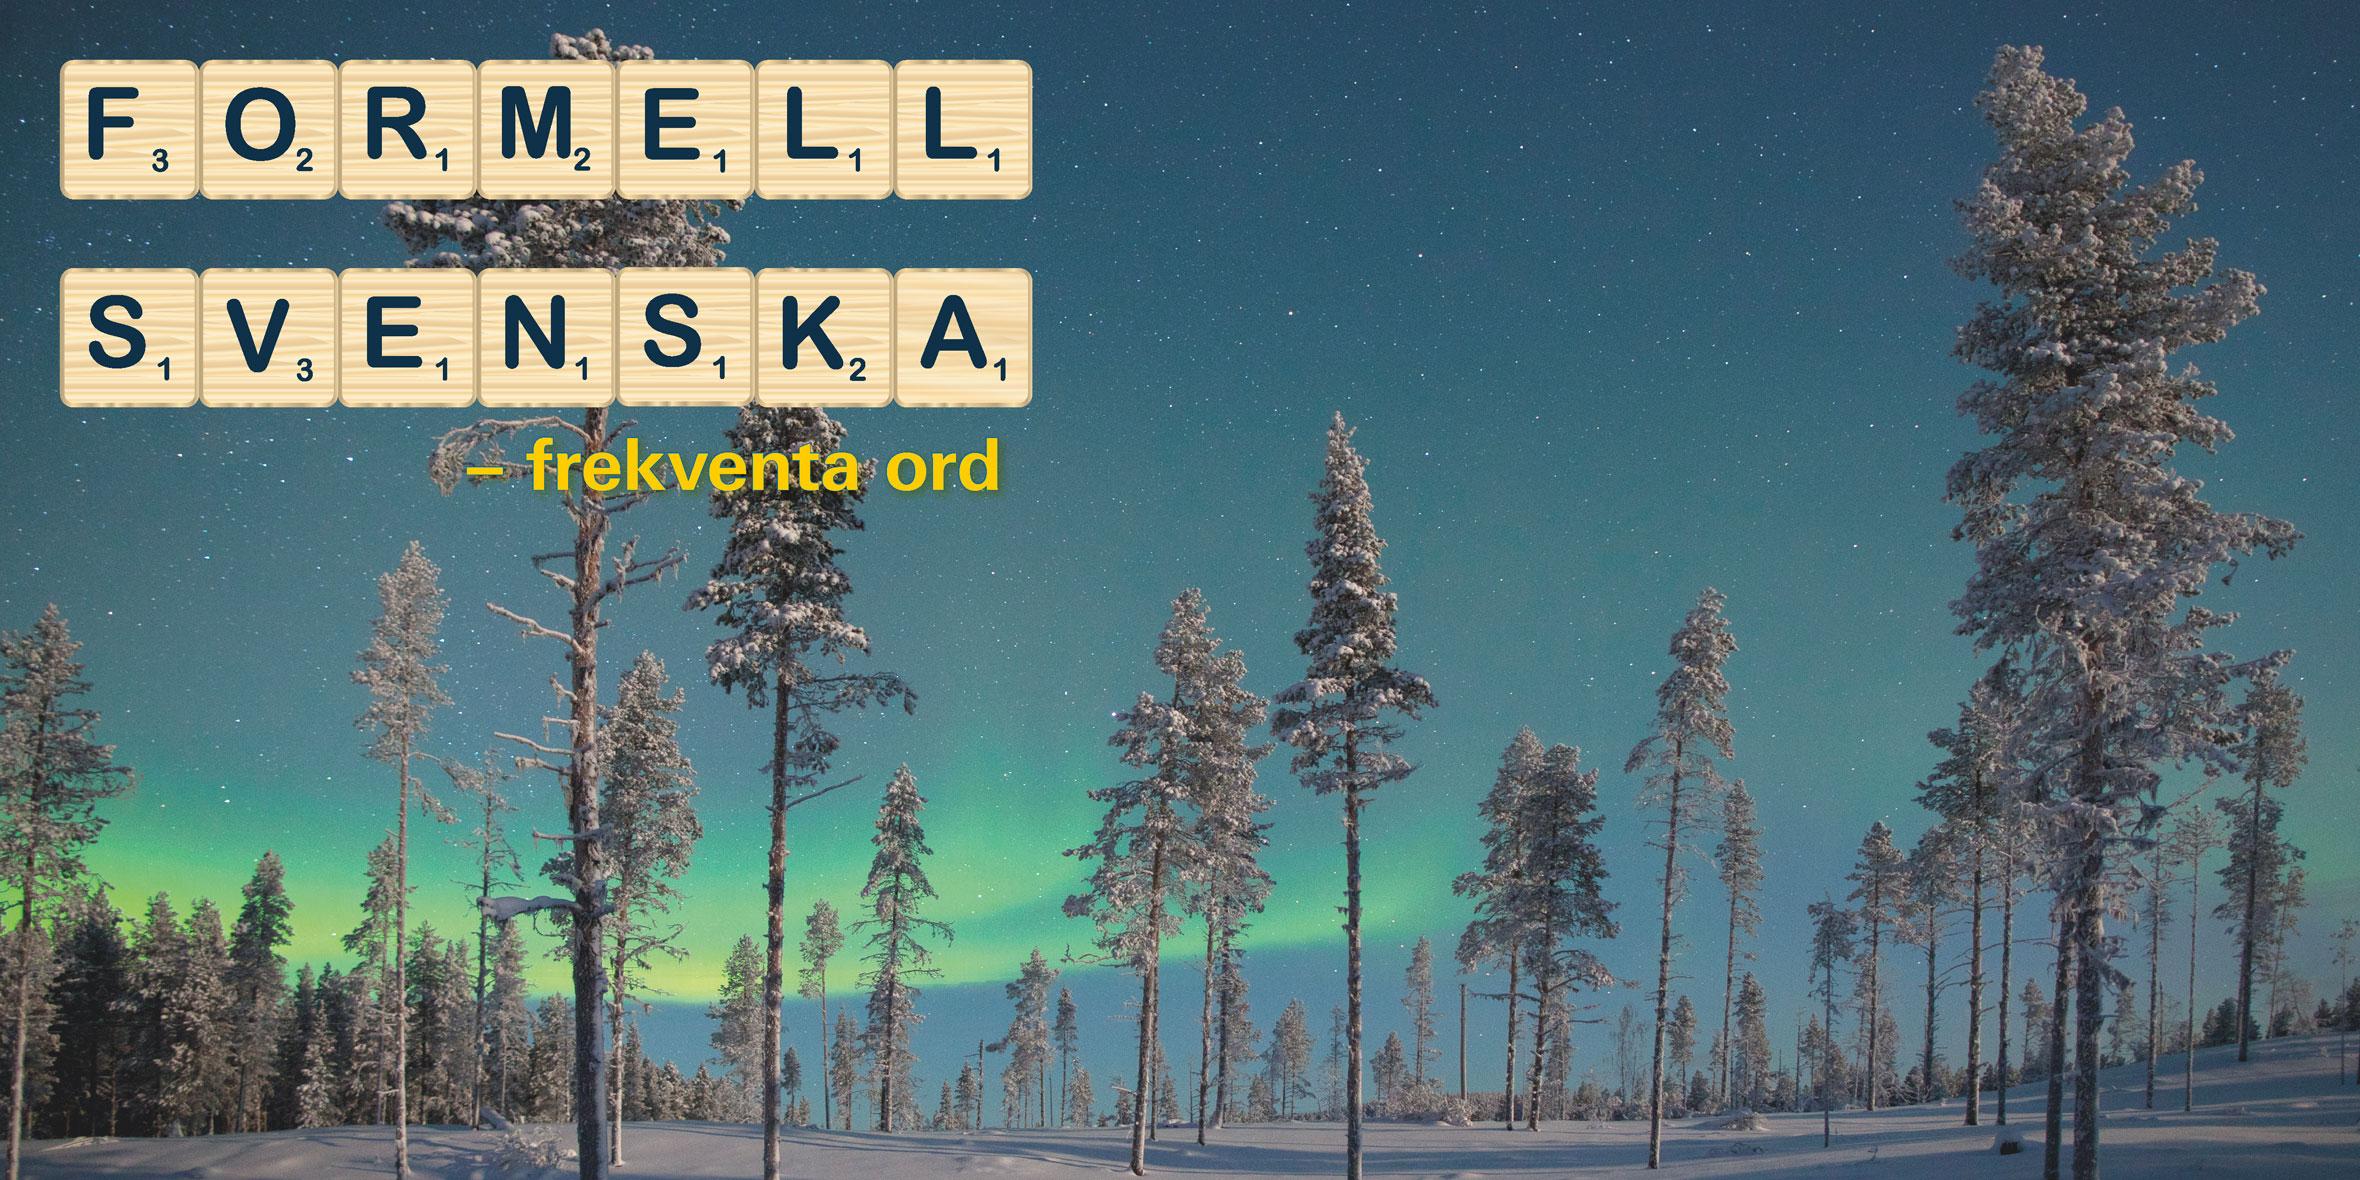 Formell svenska – frekventa ord